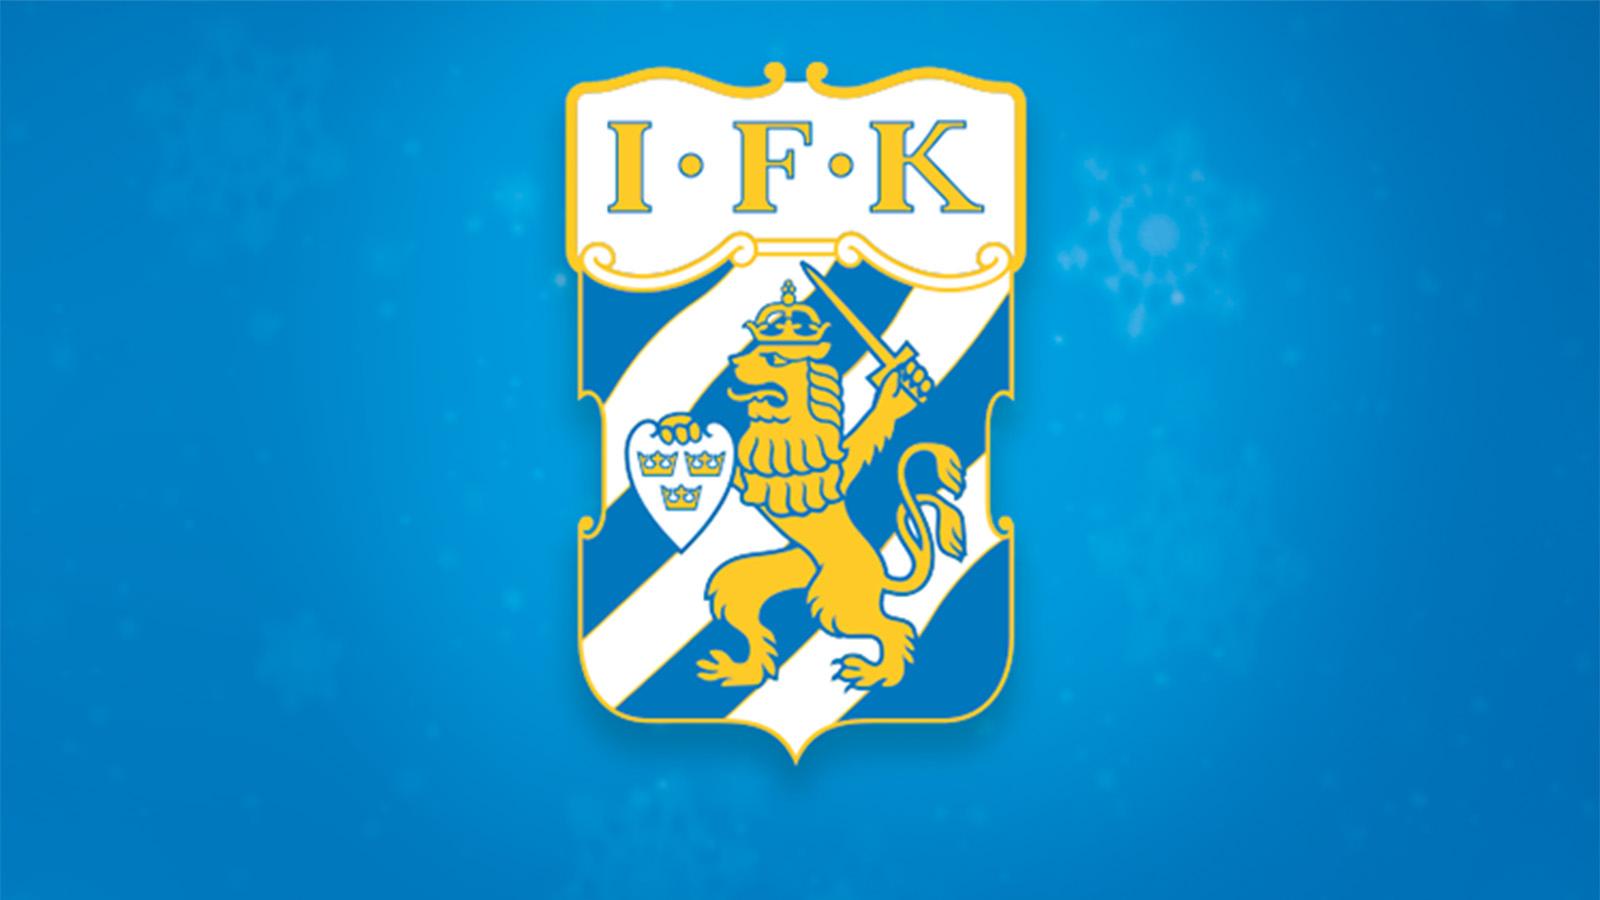 IFK Göteborgs julkalender 2018